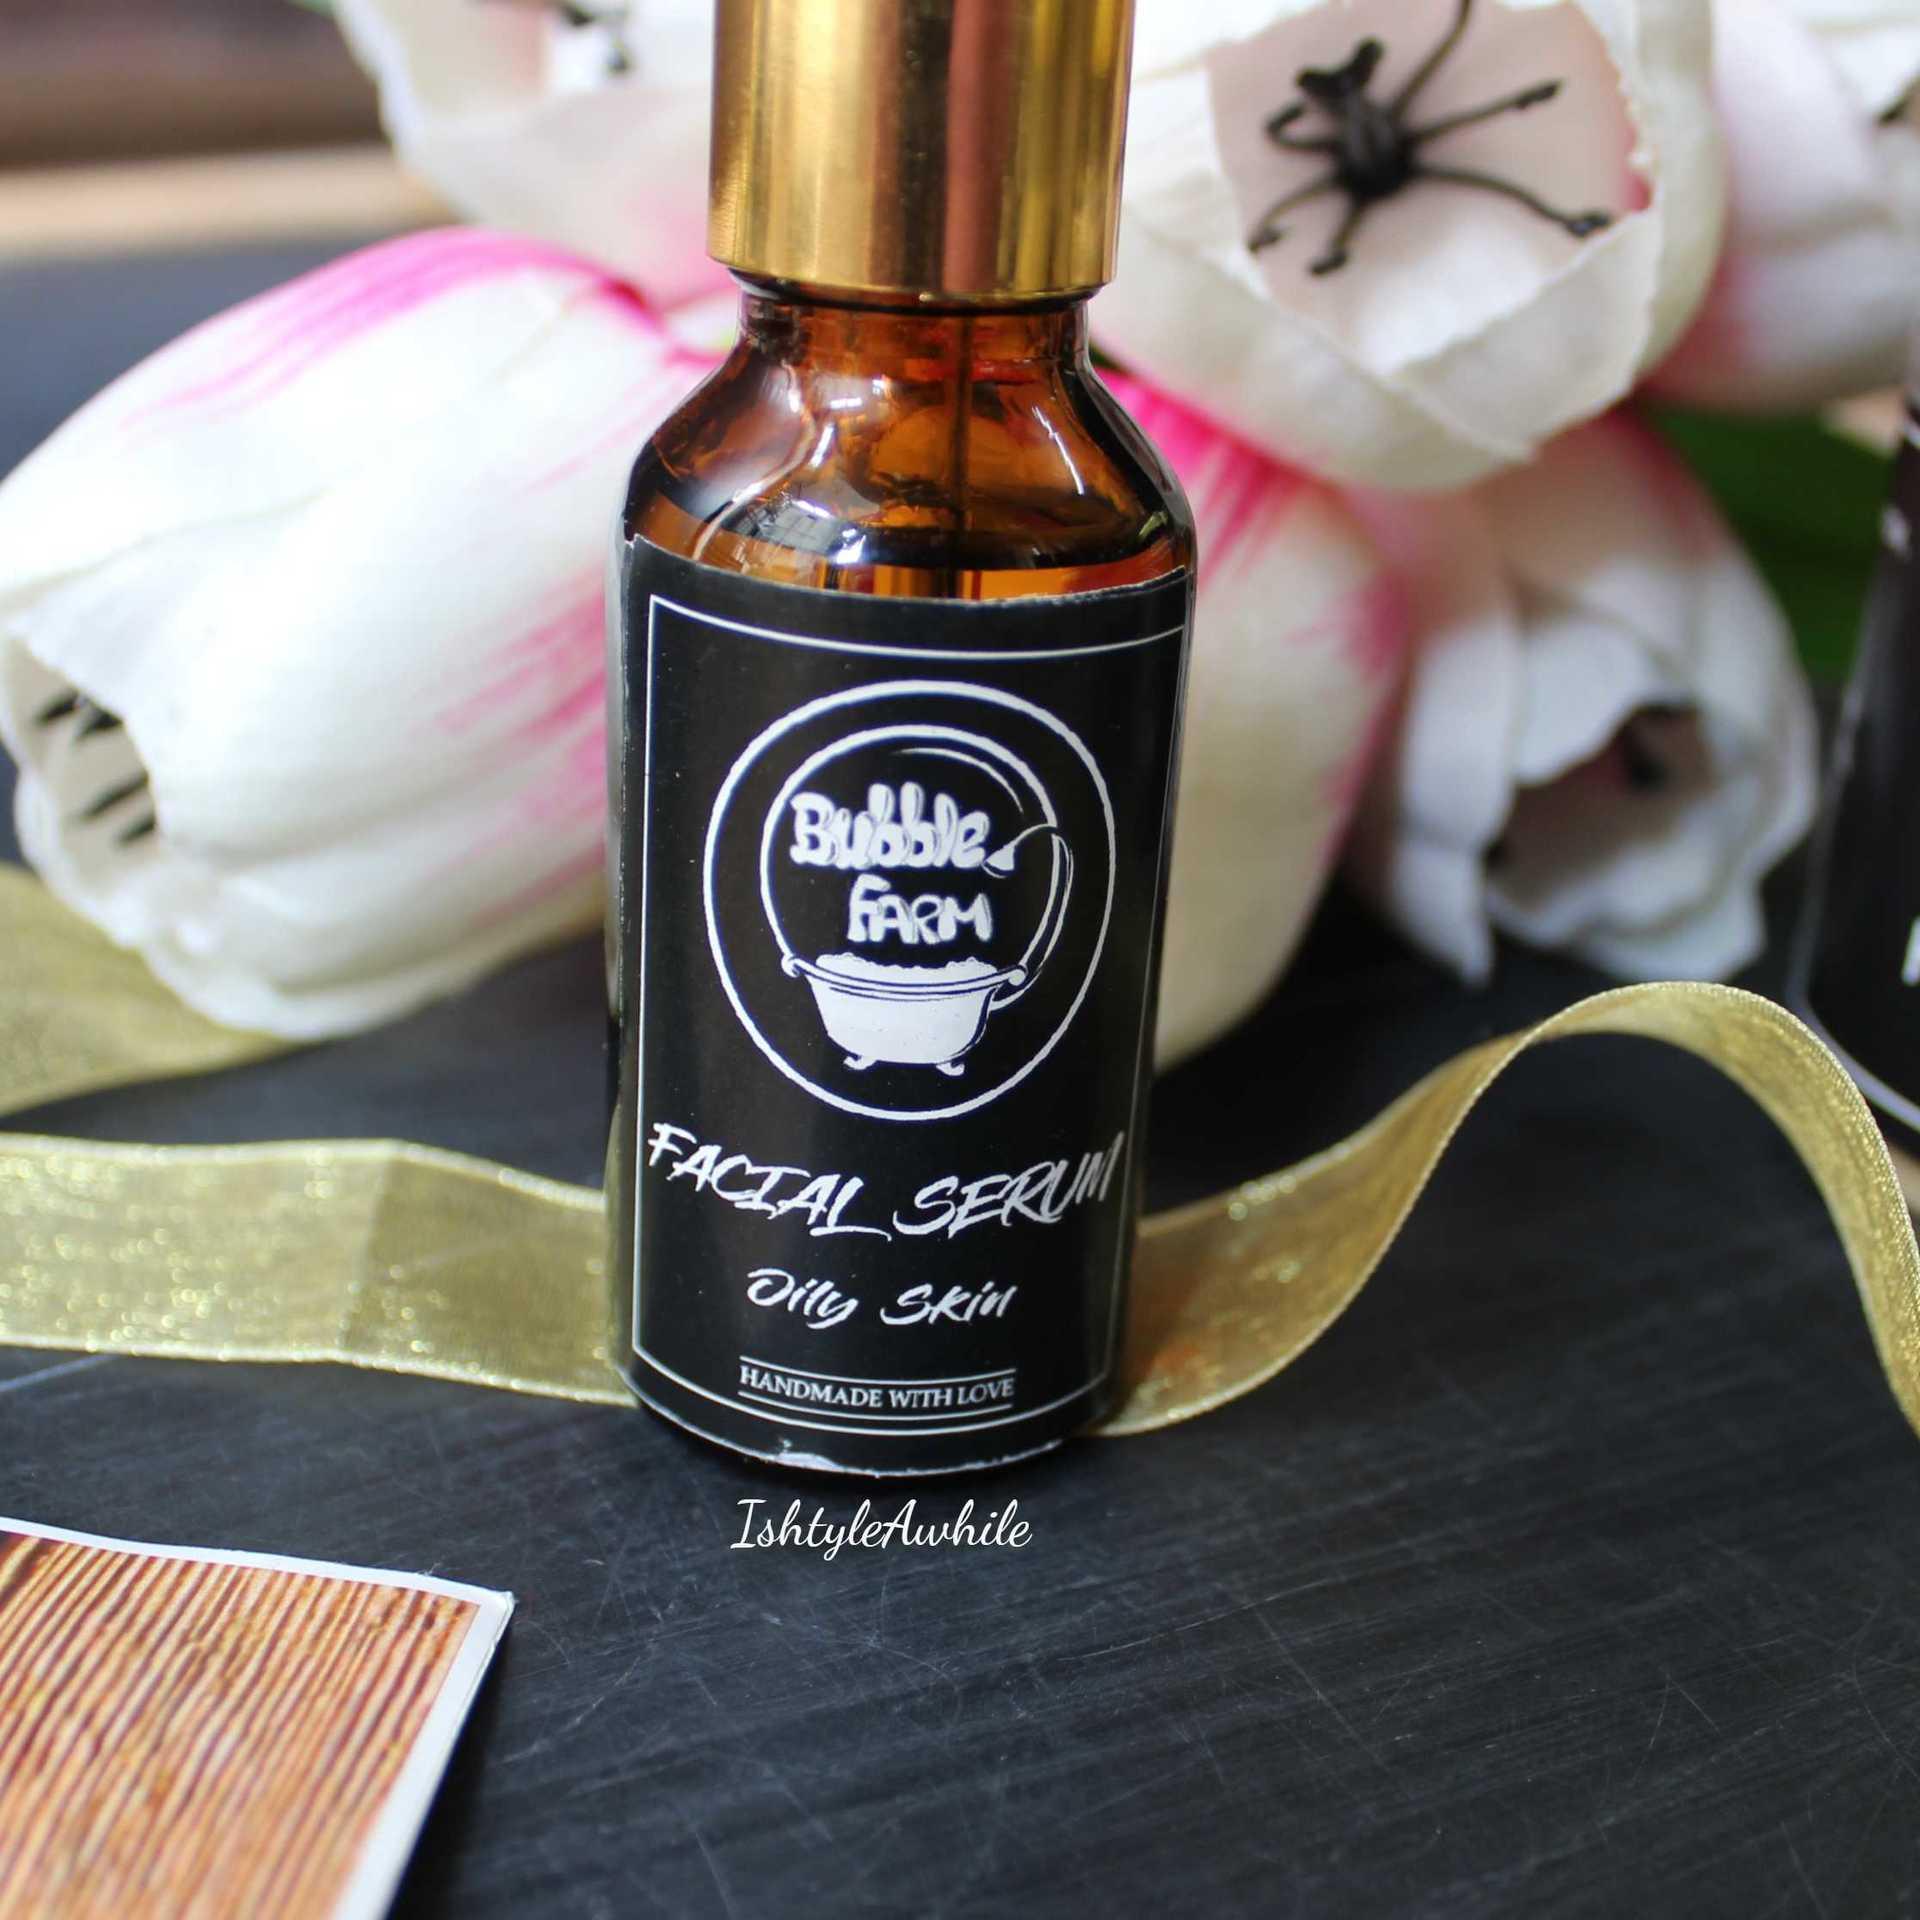 IshtyleAwhile - A Chennai based Indian Fashion Blog - Facial Serum for oily skin bubble farm skincare